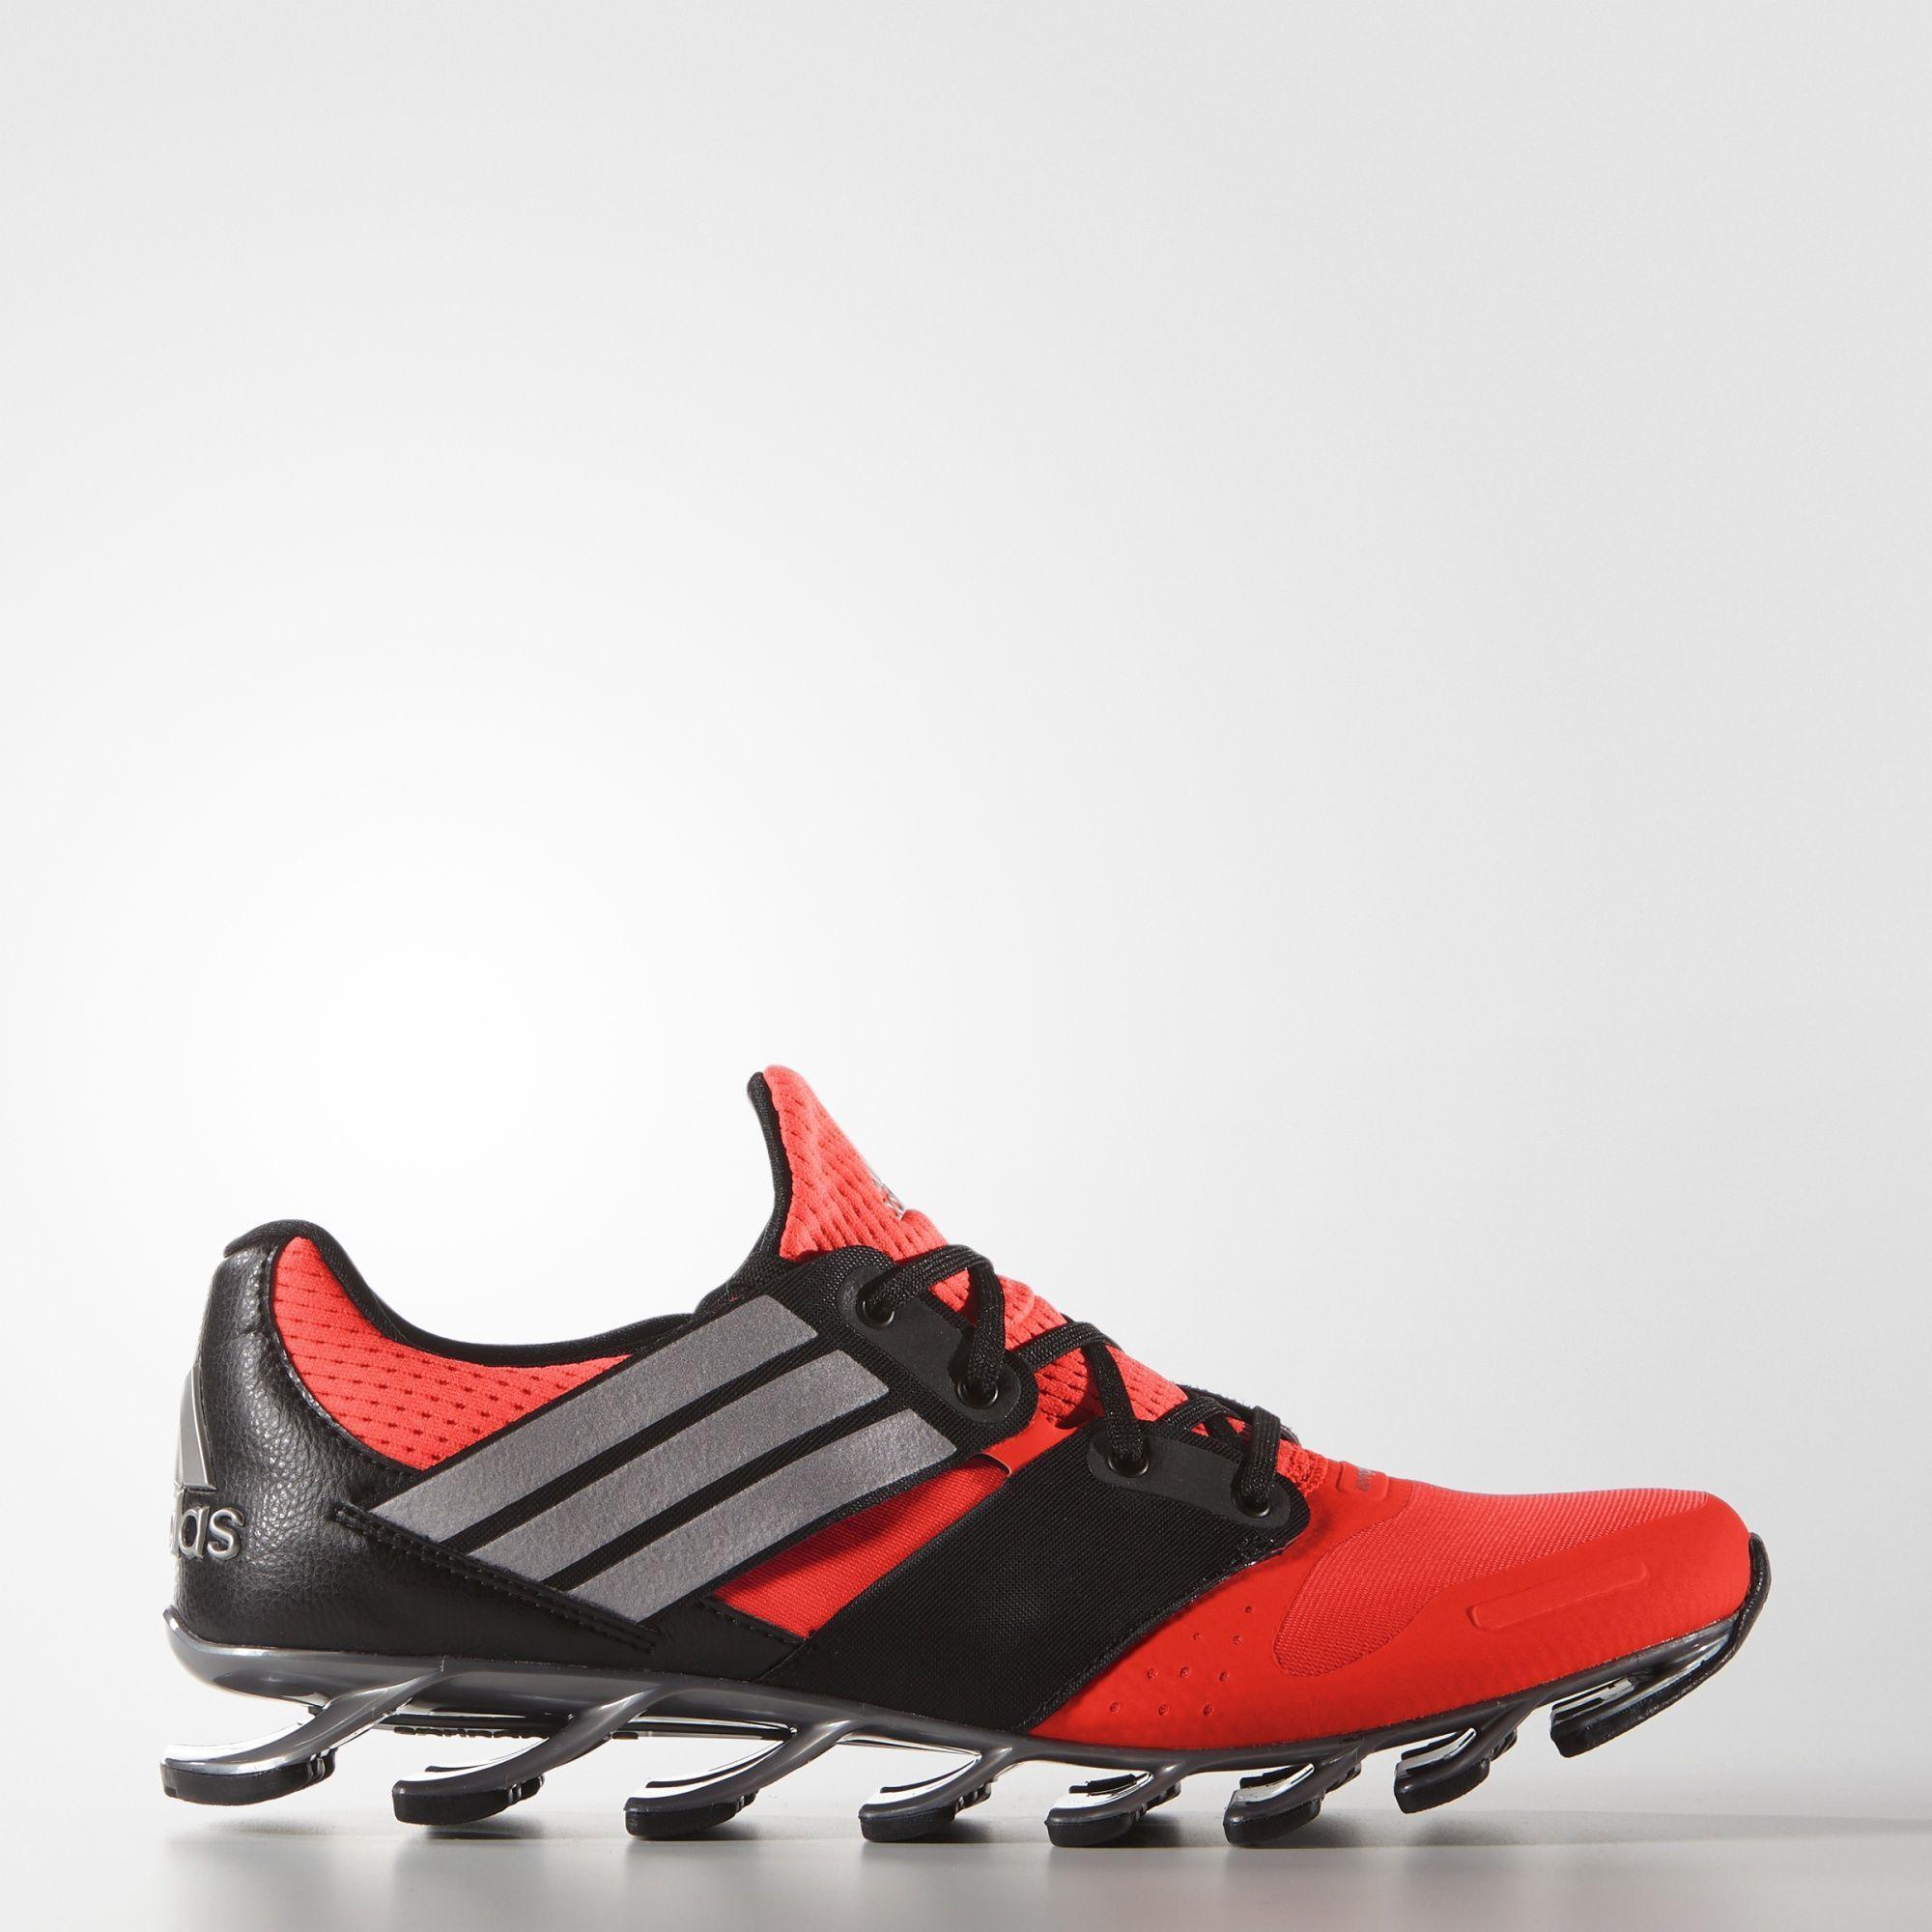 Adidas springblade schoenen